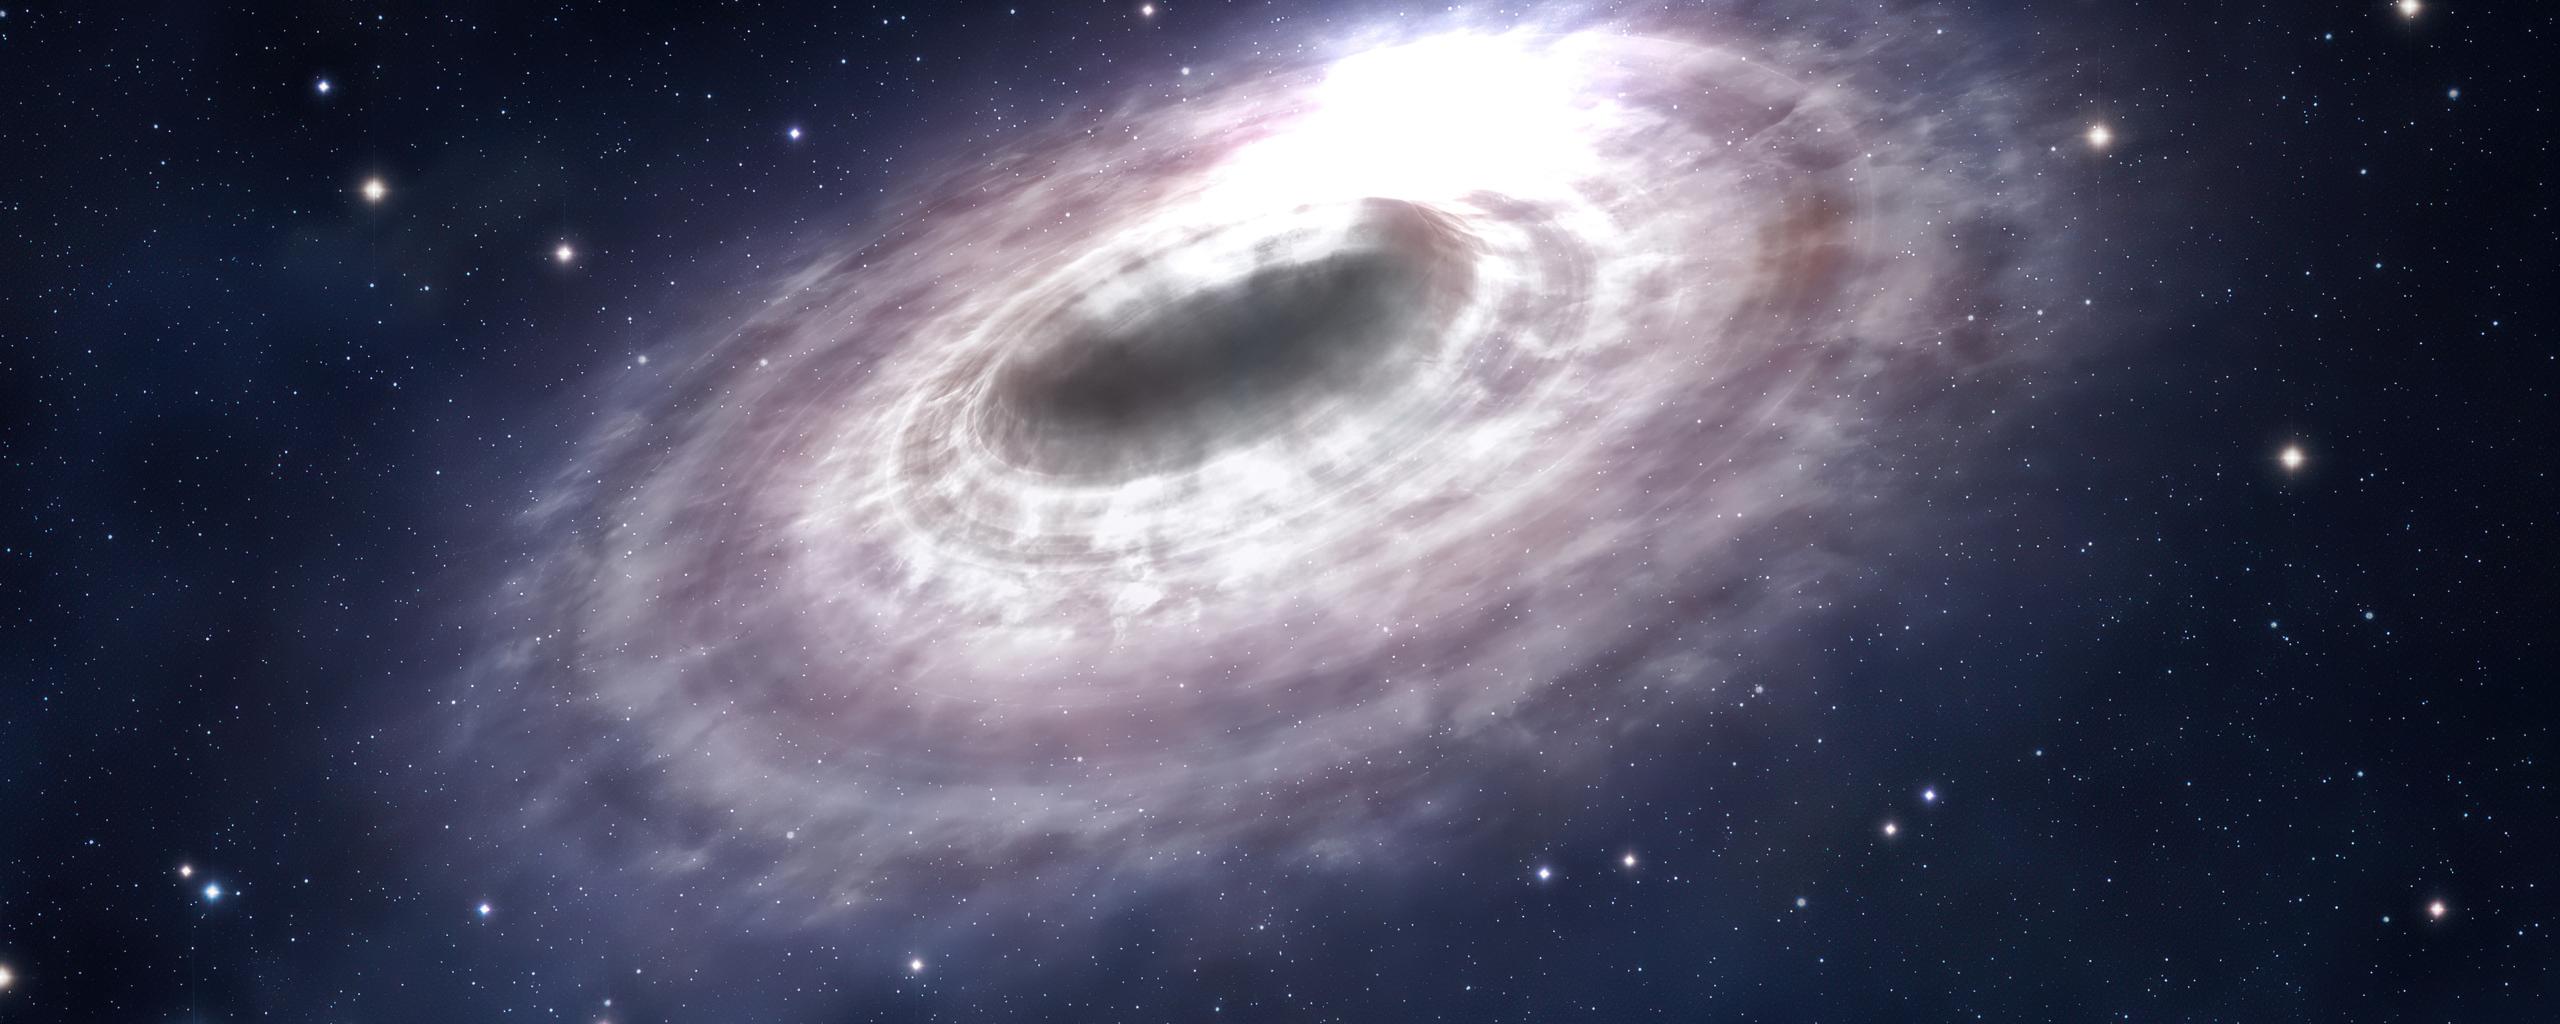 galaxy-outer-space-4k-lu.jpg